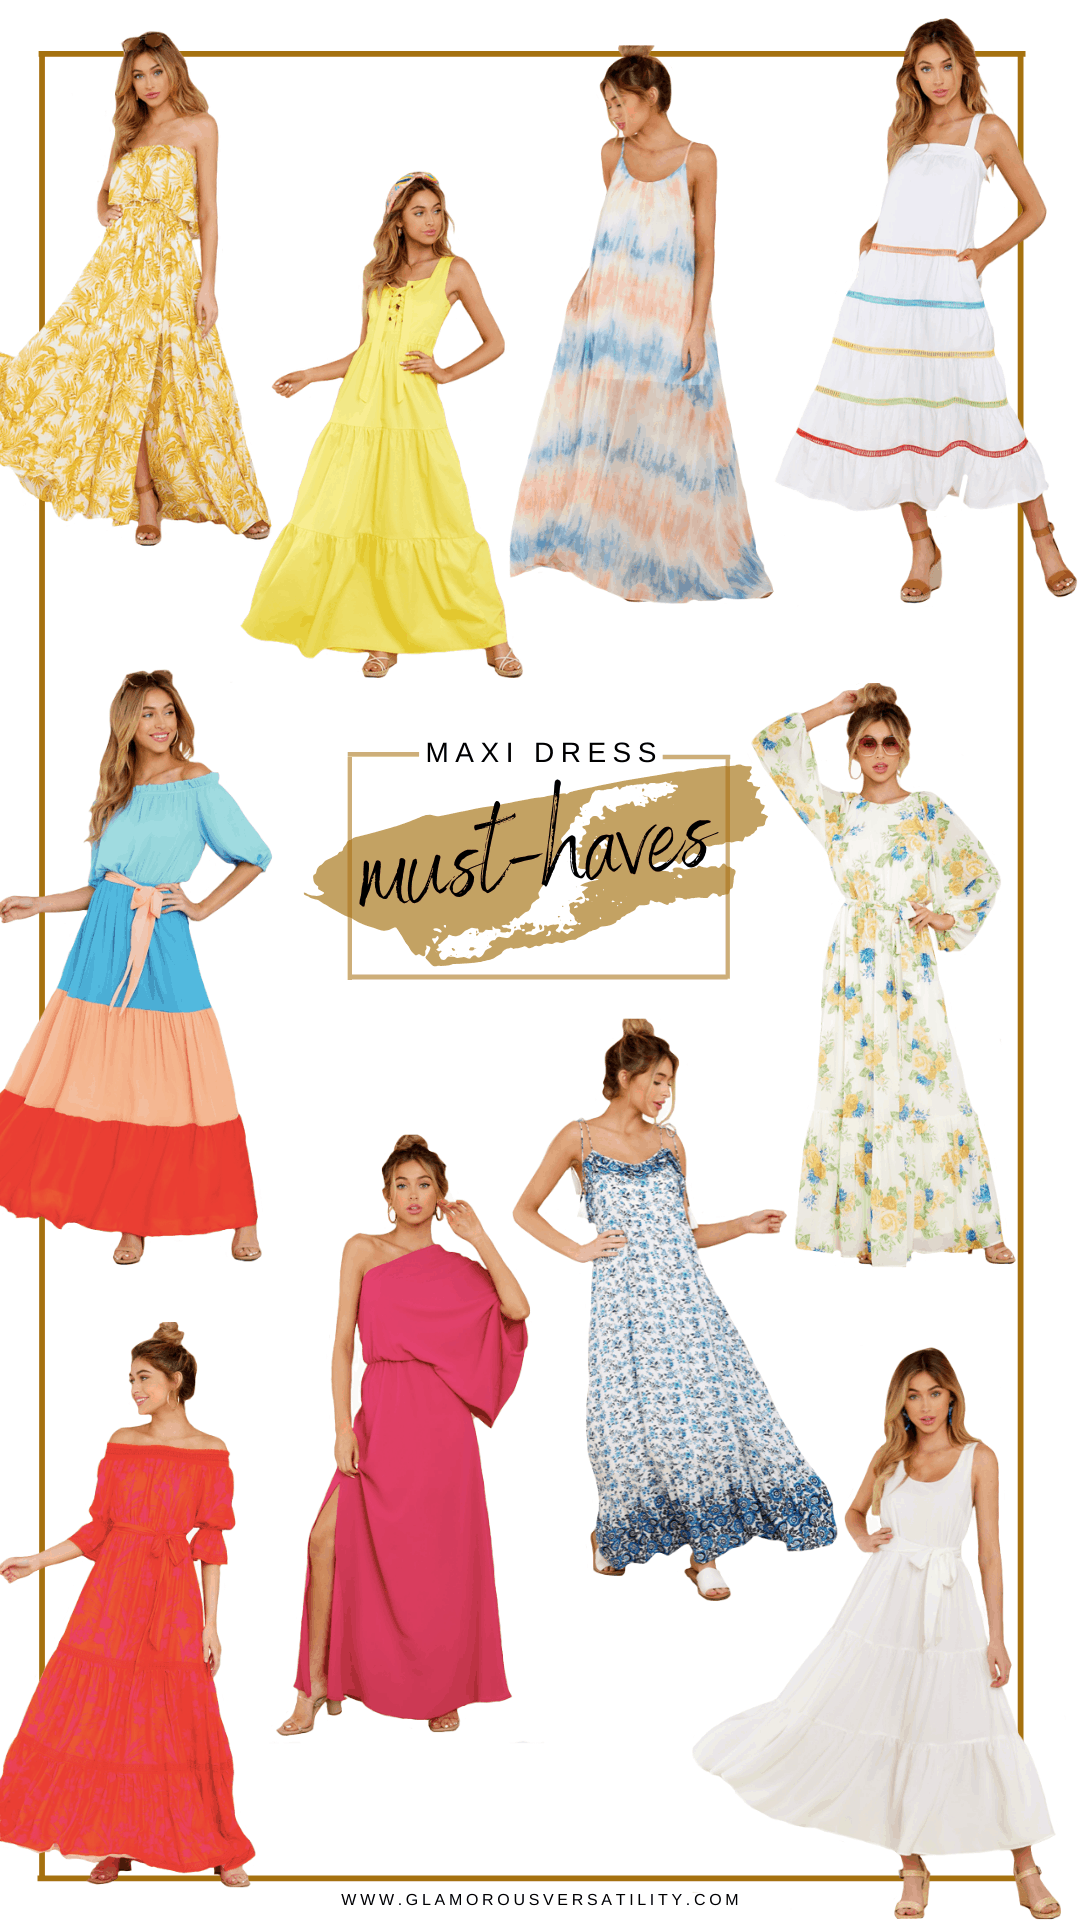 Maxi Dresses by popular Dallas fashion blog, Glamorous Versatility: collage image of various maxi dresses.